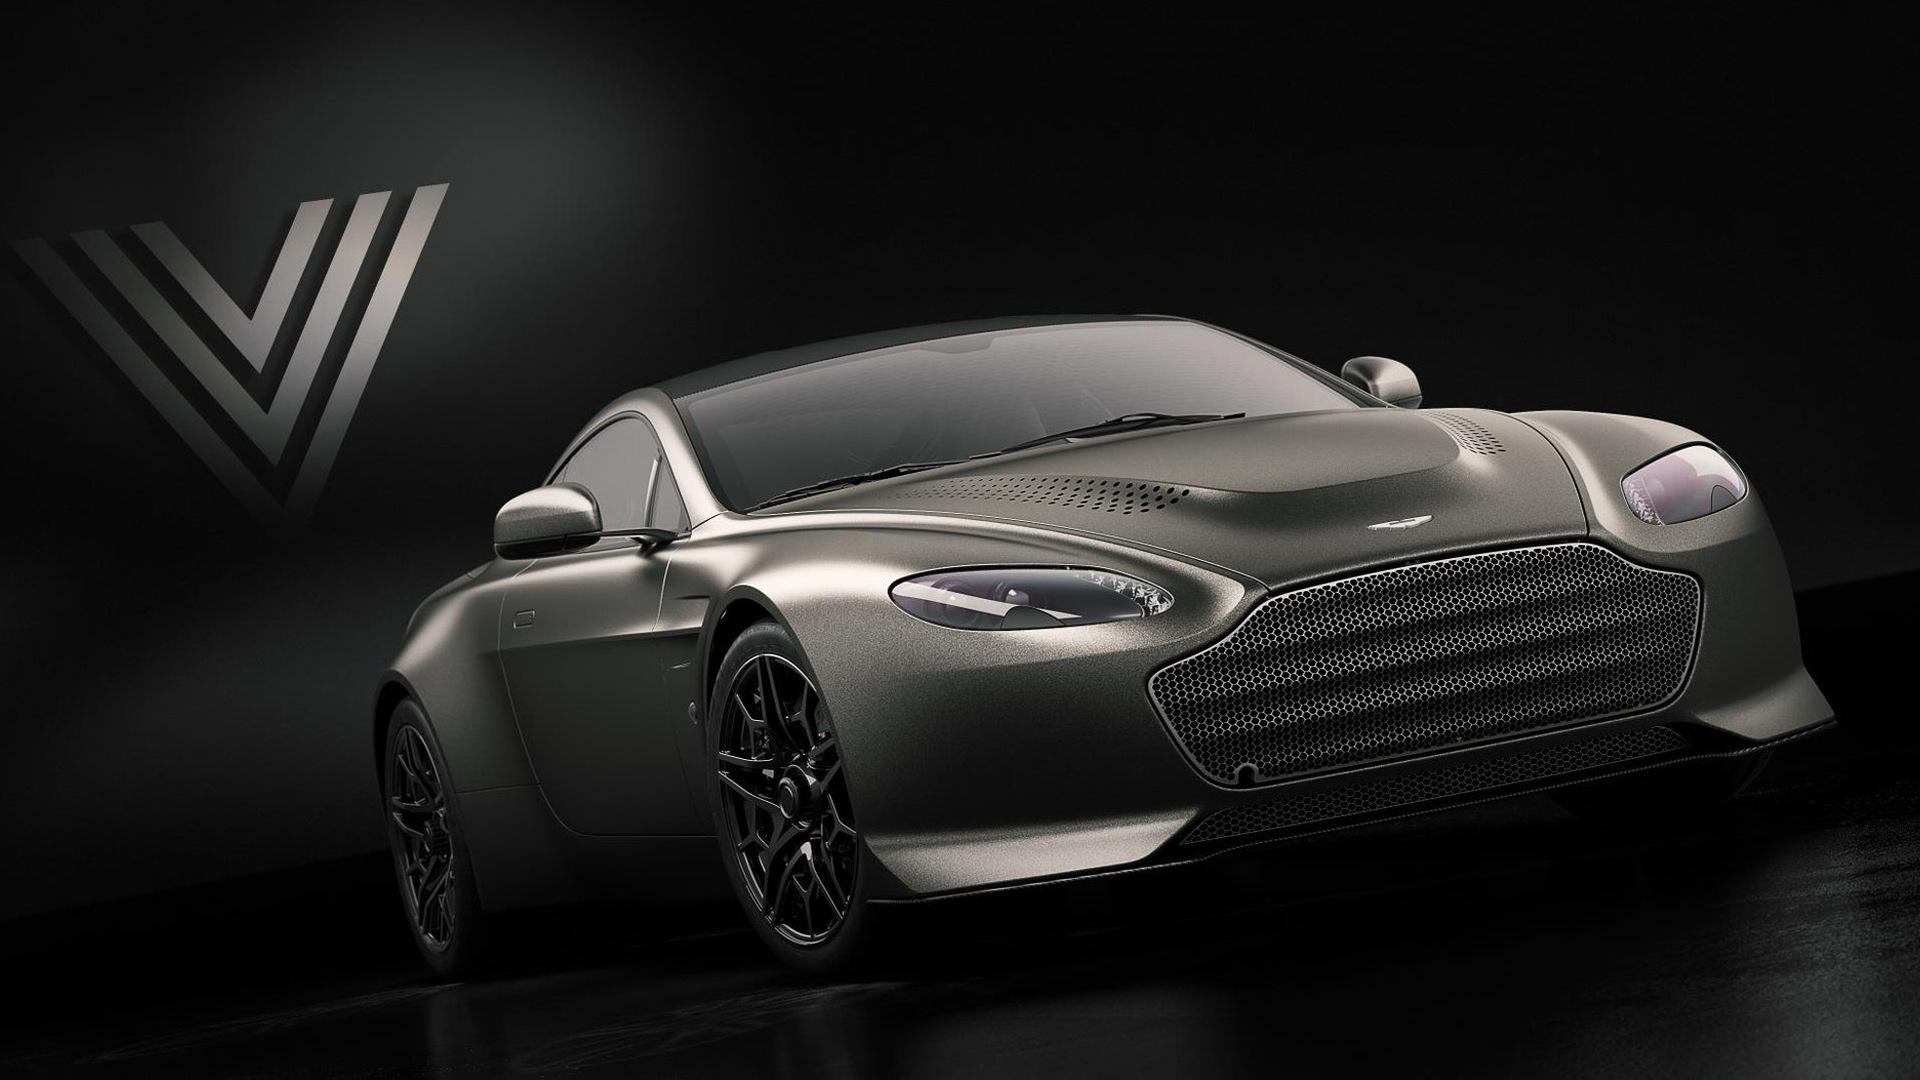 2018 Aston Martin V12 Vantage V600